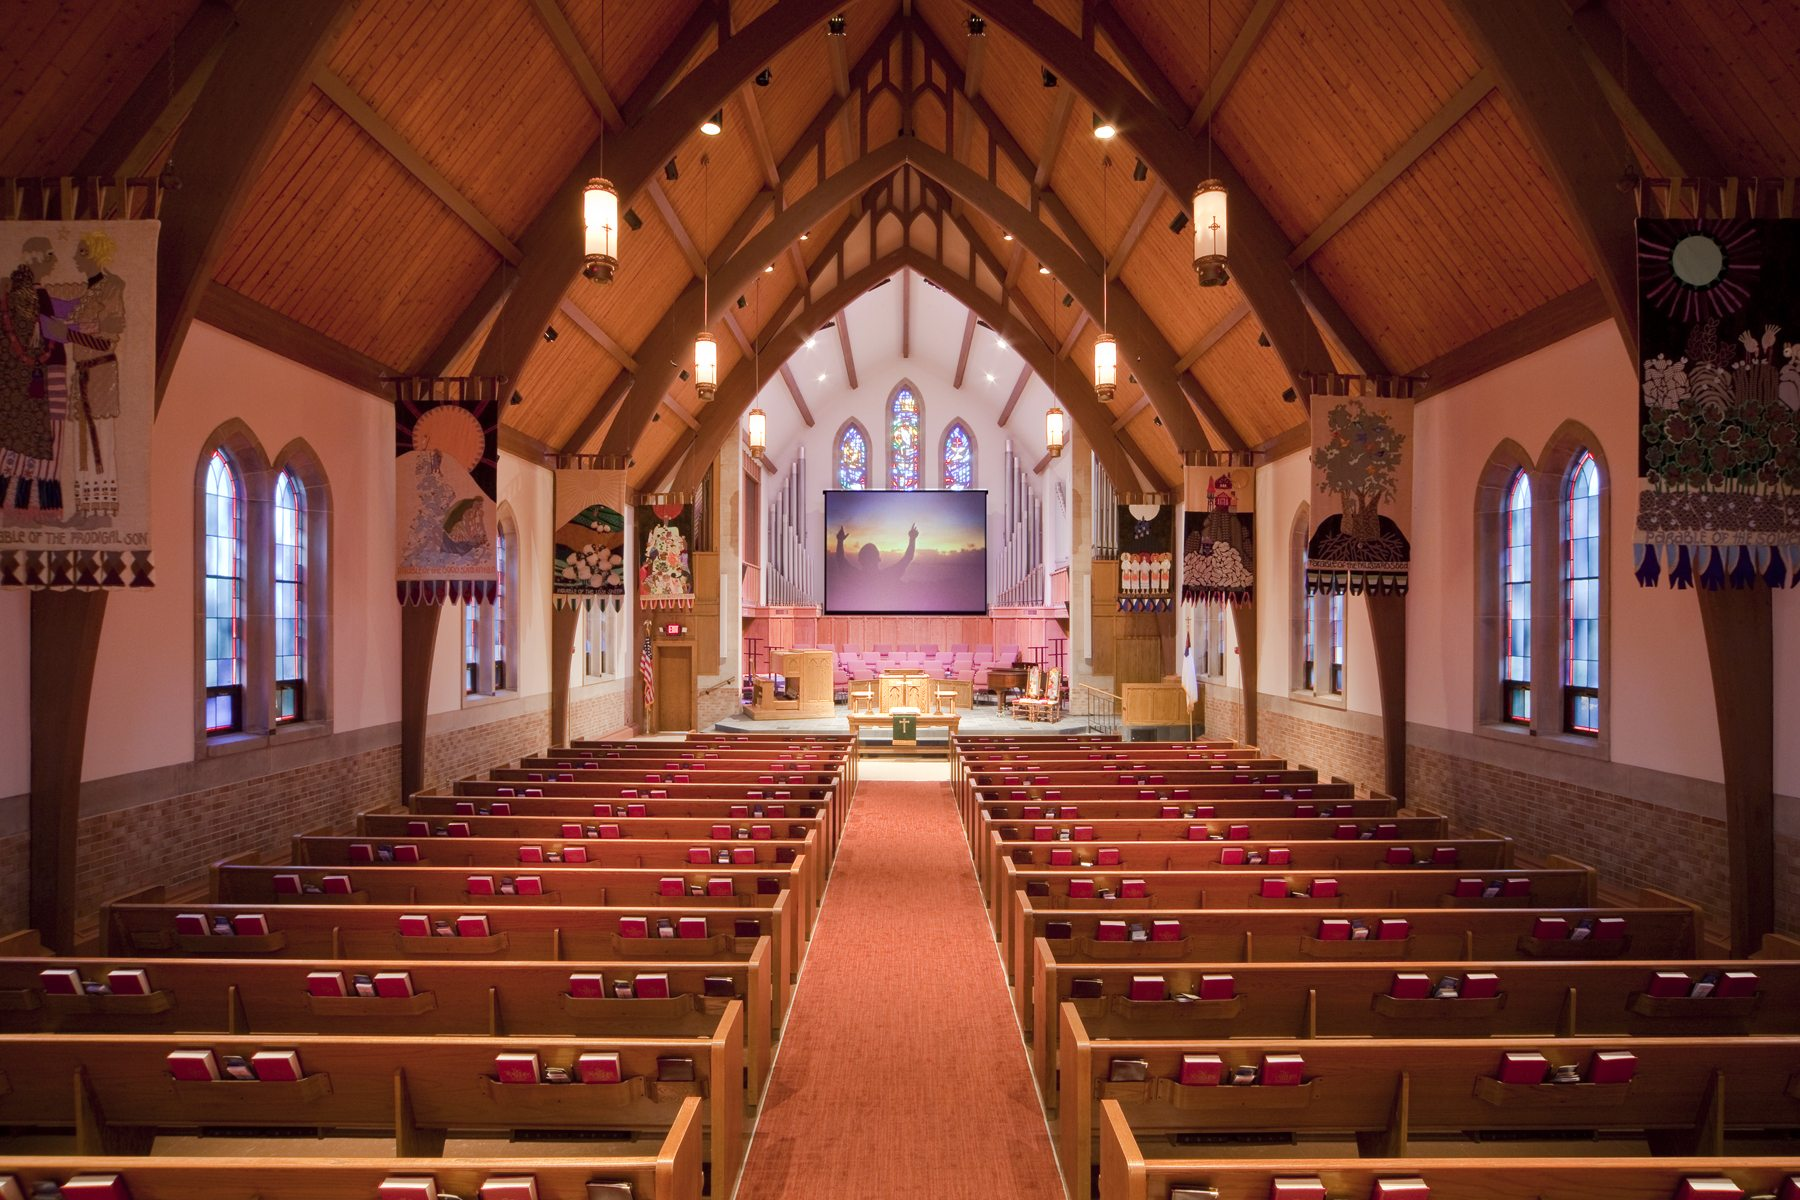 Bonhomme Presbyterian Church - Early Childhood